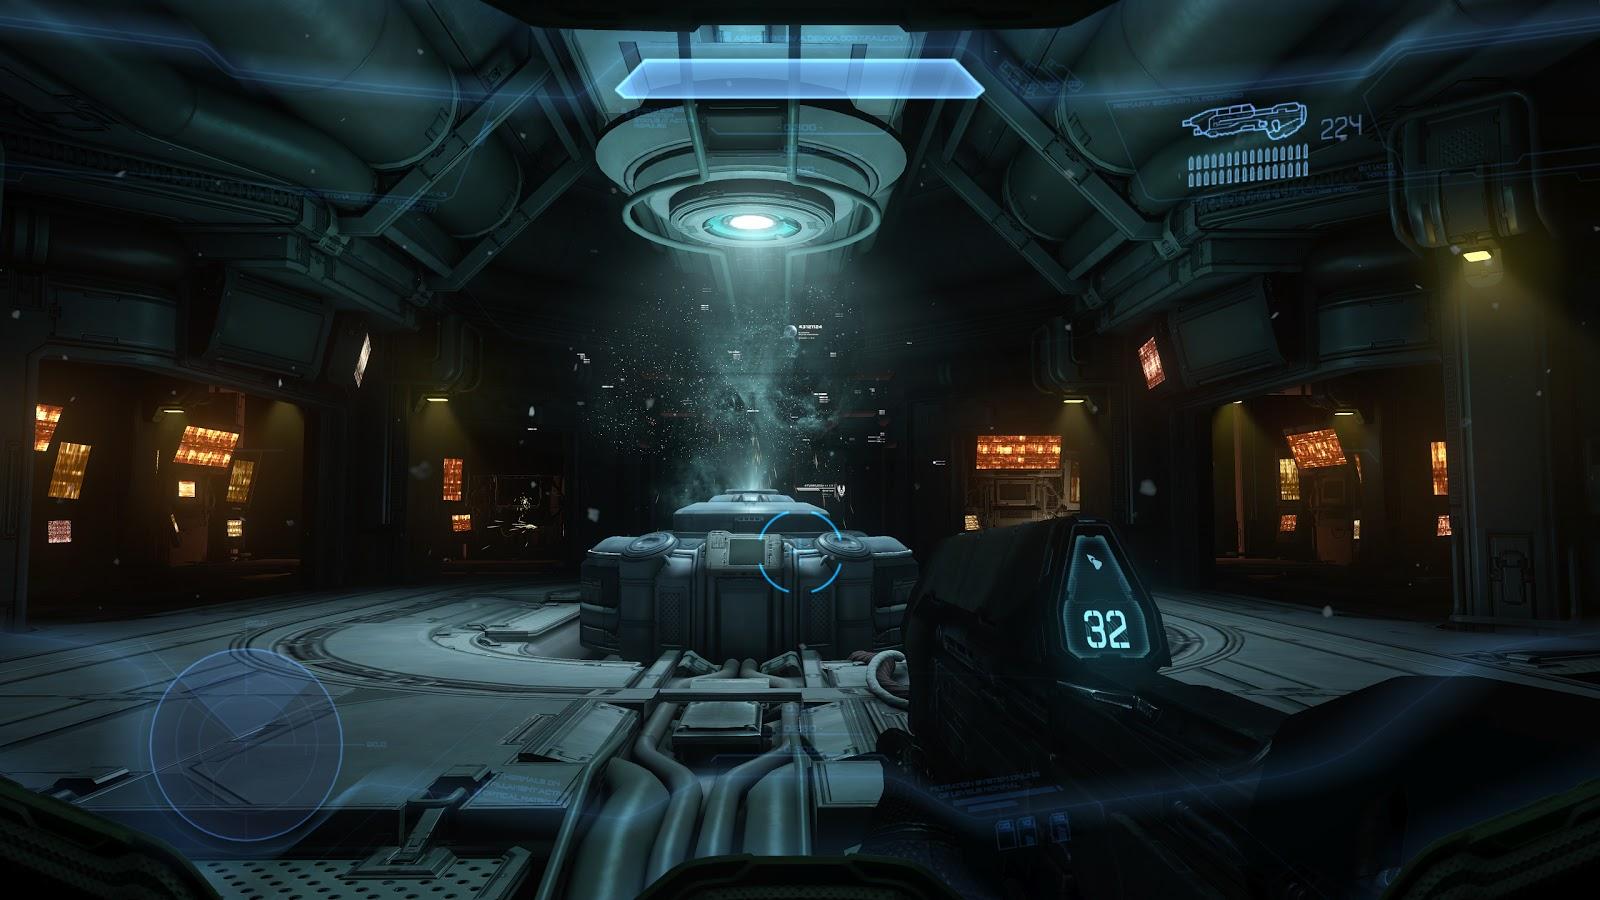 Halo4-Gameplay-4.jpg